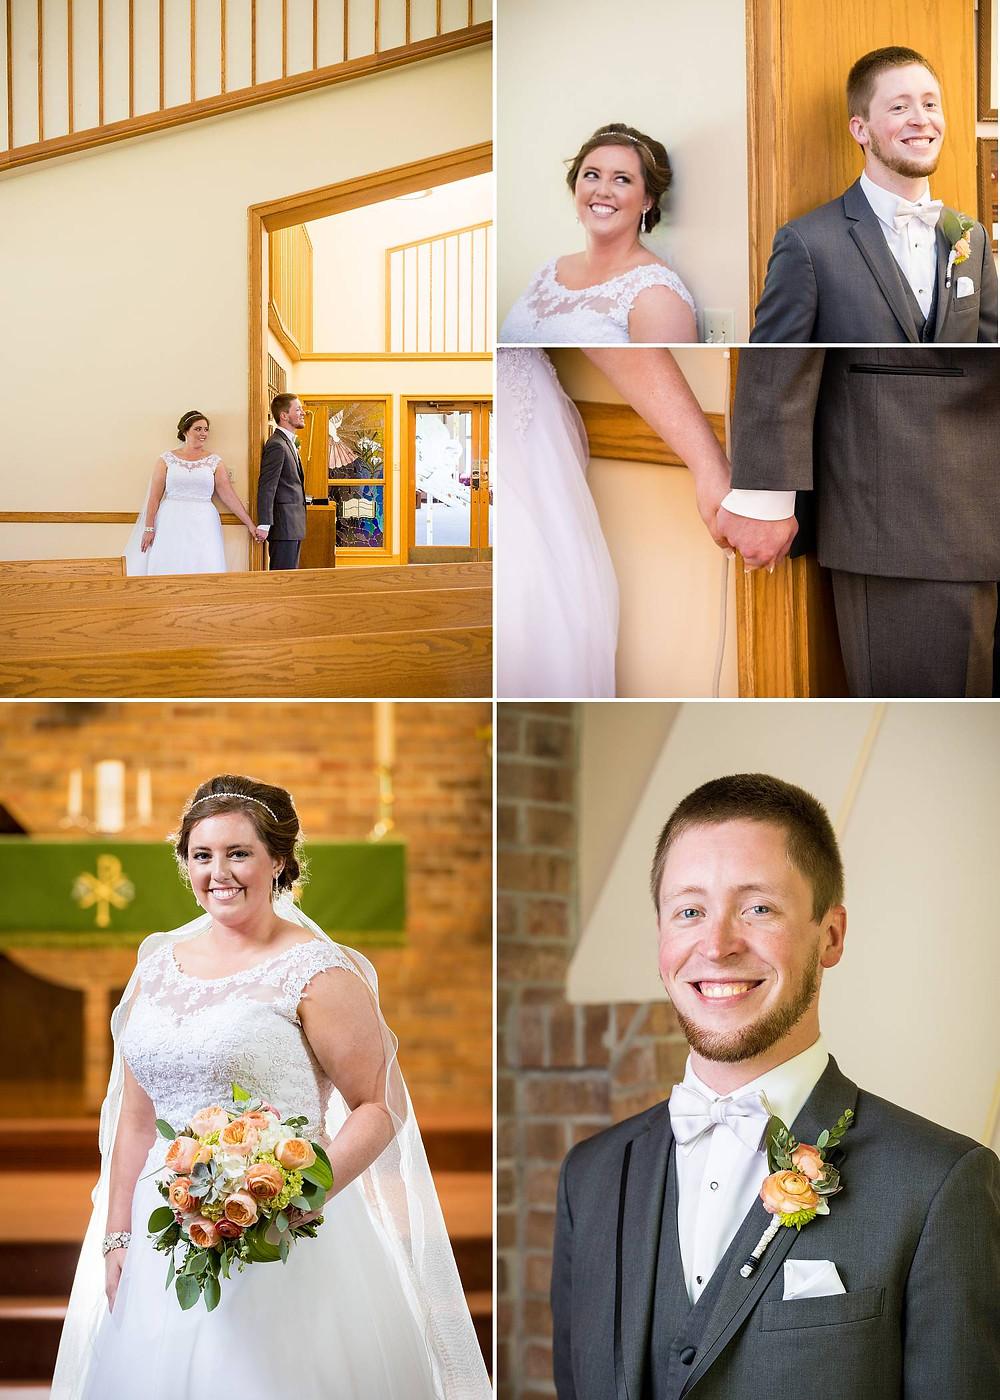 Oshkosh Wisconsin Wedding First Look | Lanari Photography